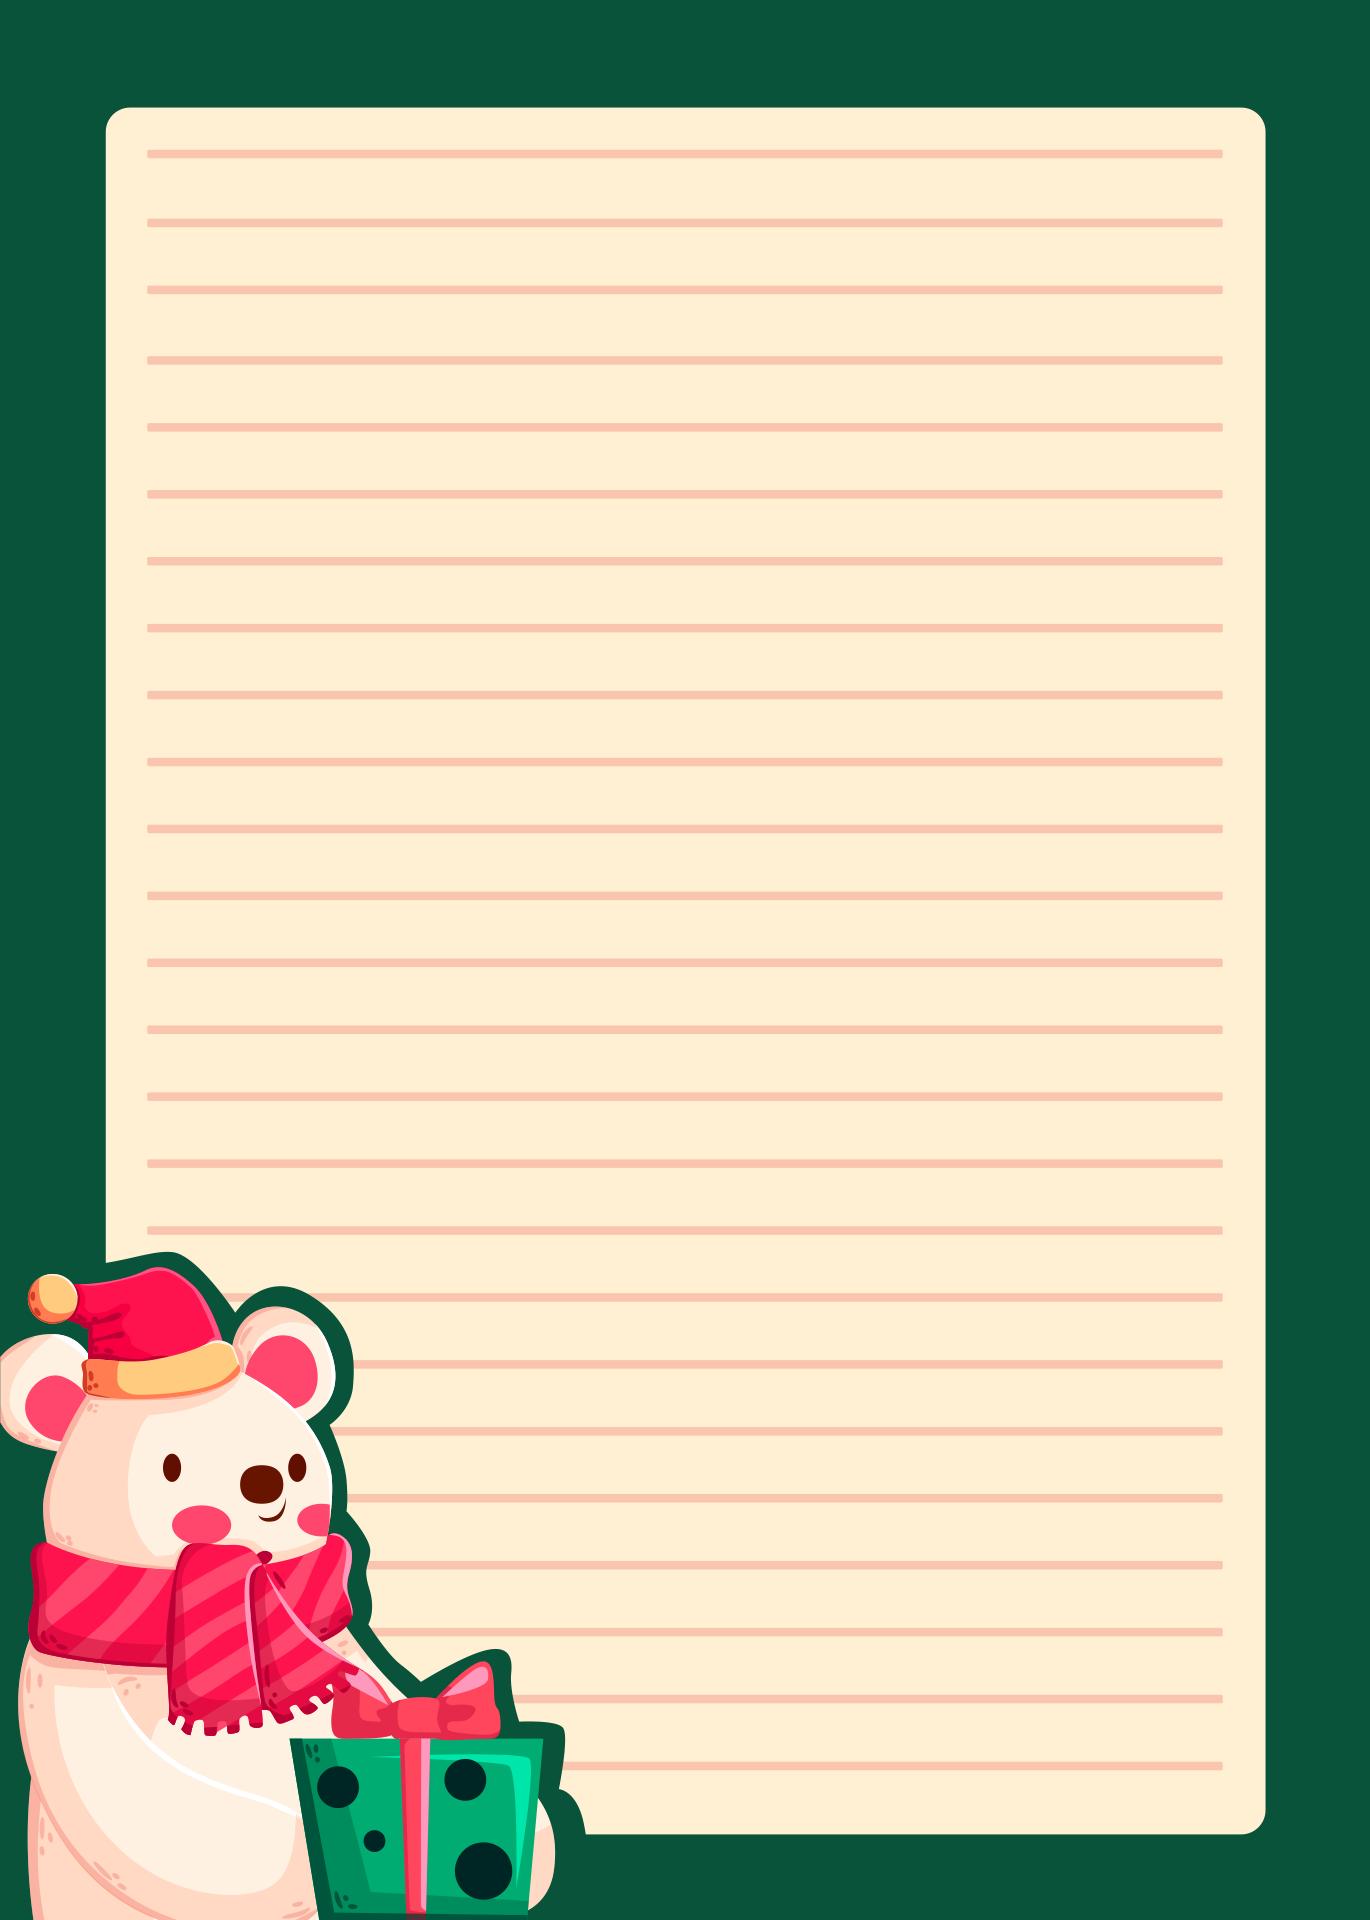 Printable Christmas Stationery Paper